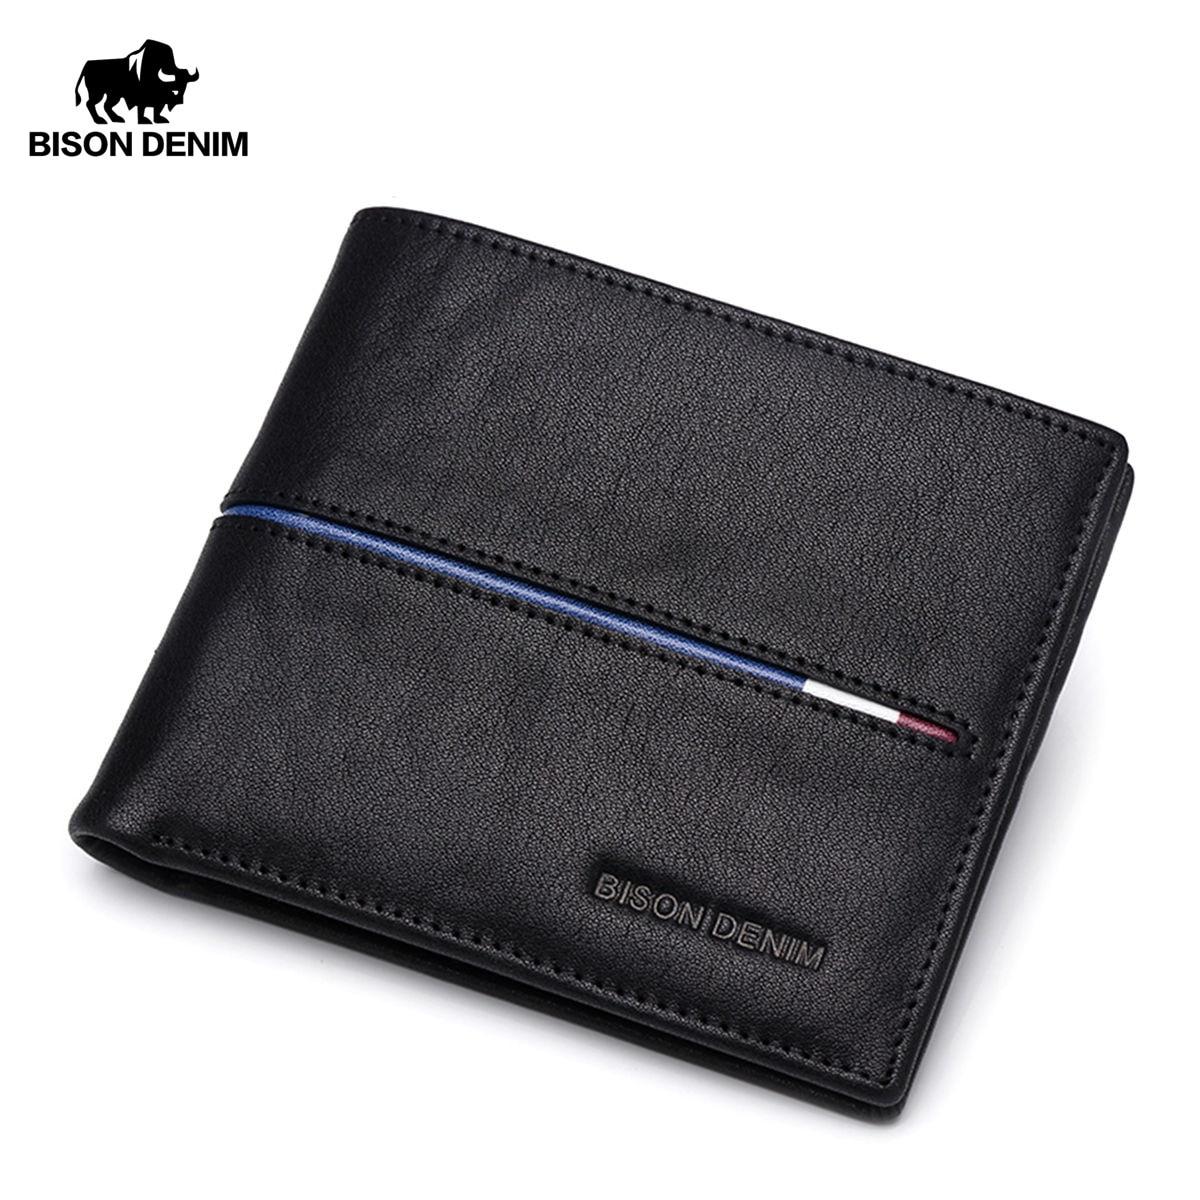 Wallet for Men-RFID Blocking Bifold Wallet Zipper Leather White Tiger Wallet Card Holder